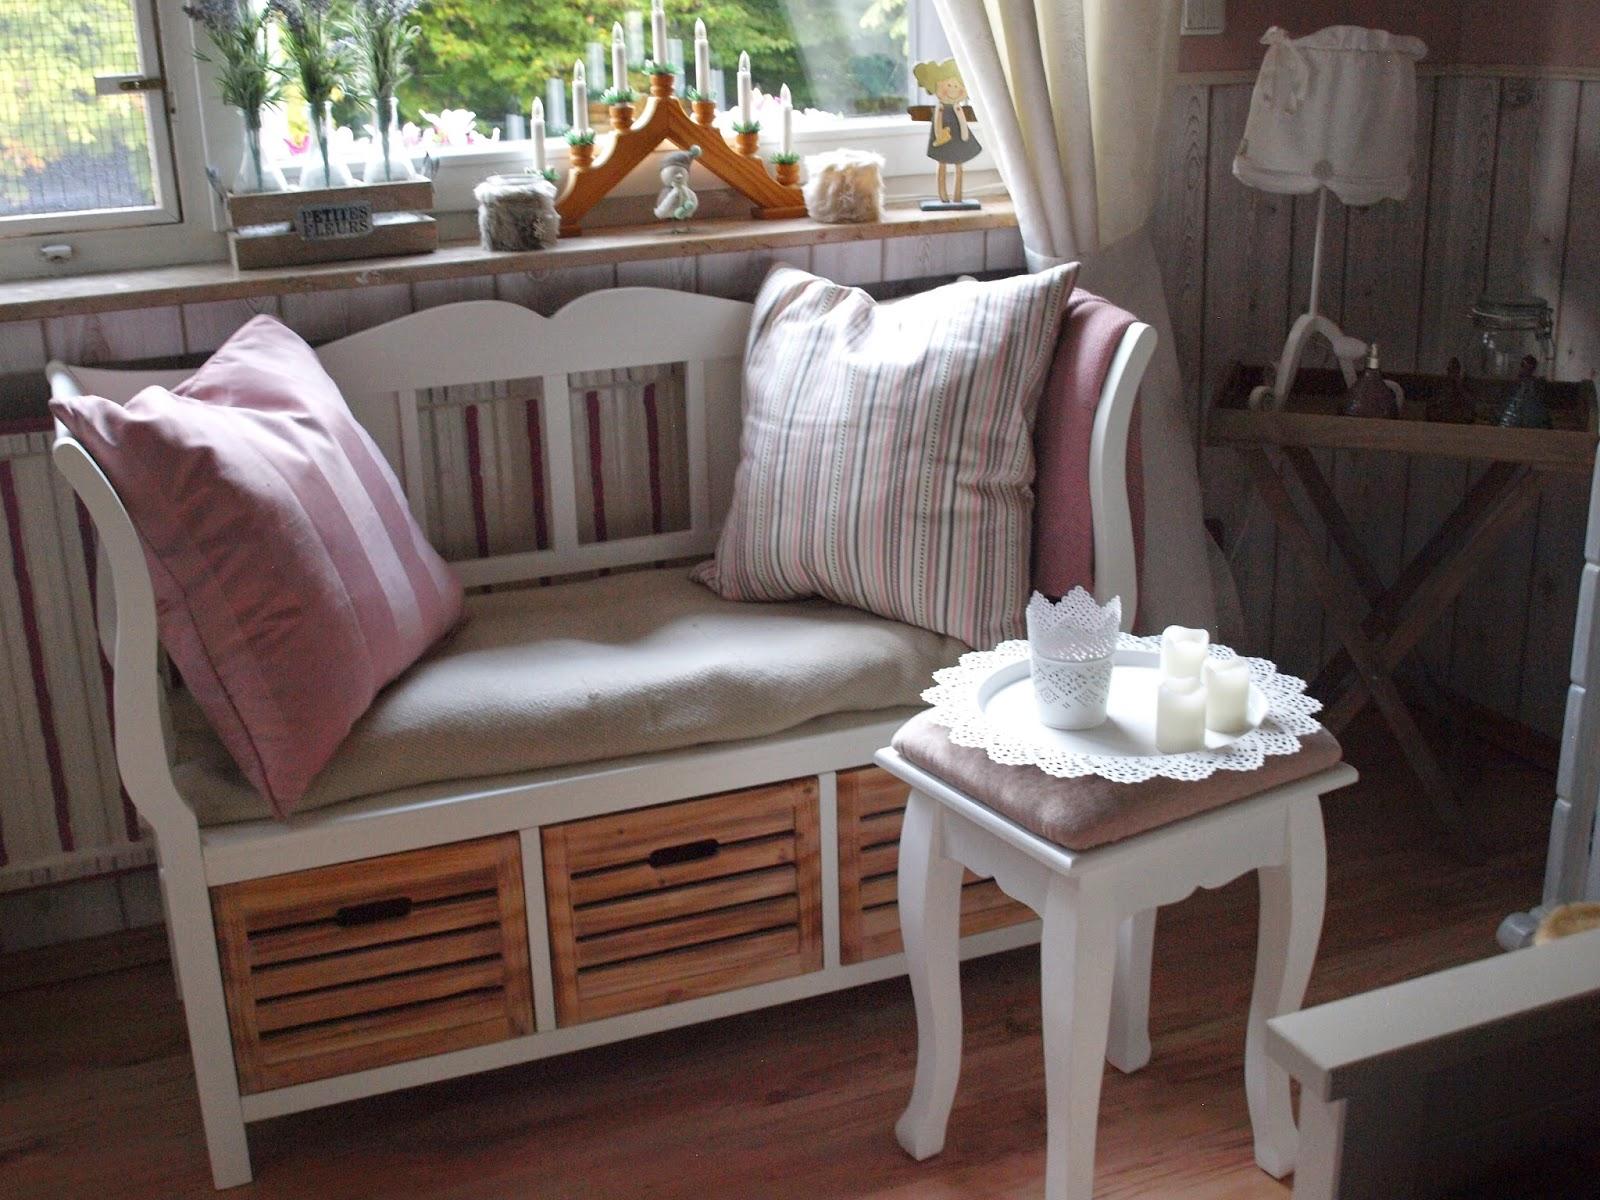 Deartally A Cozy Place